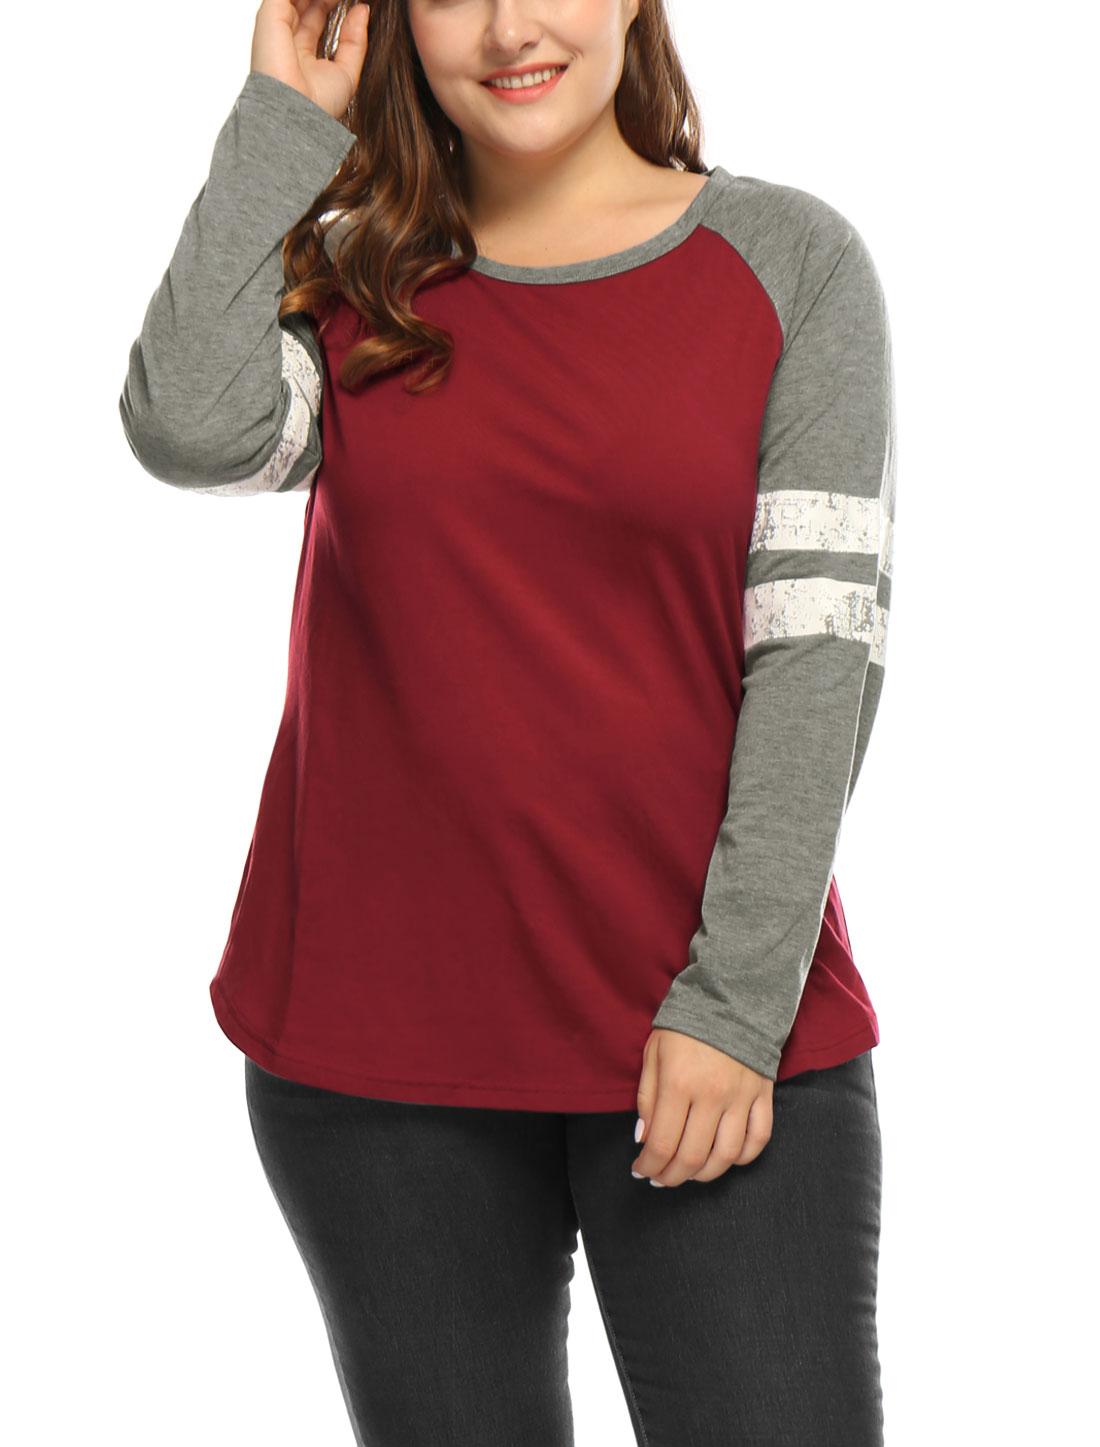 Women Plus Size Color Block Varsity-Striped Raglan Baseball T-Shirt Red 3X